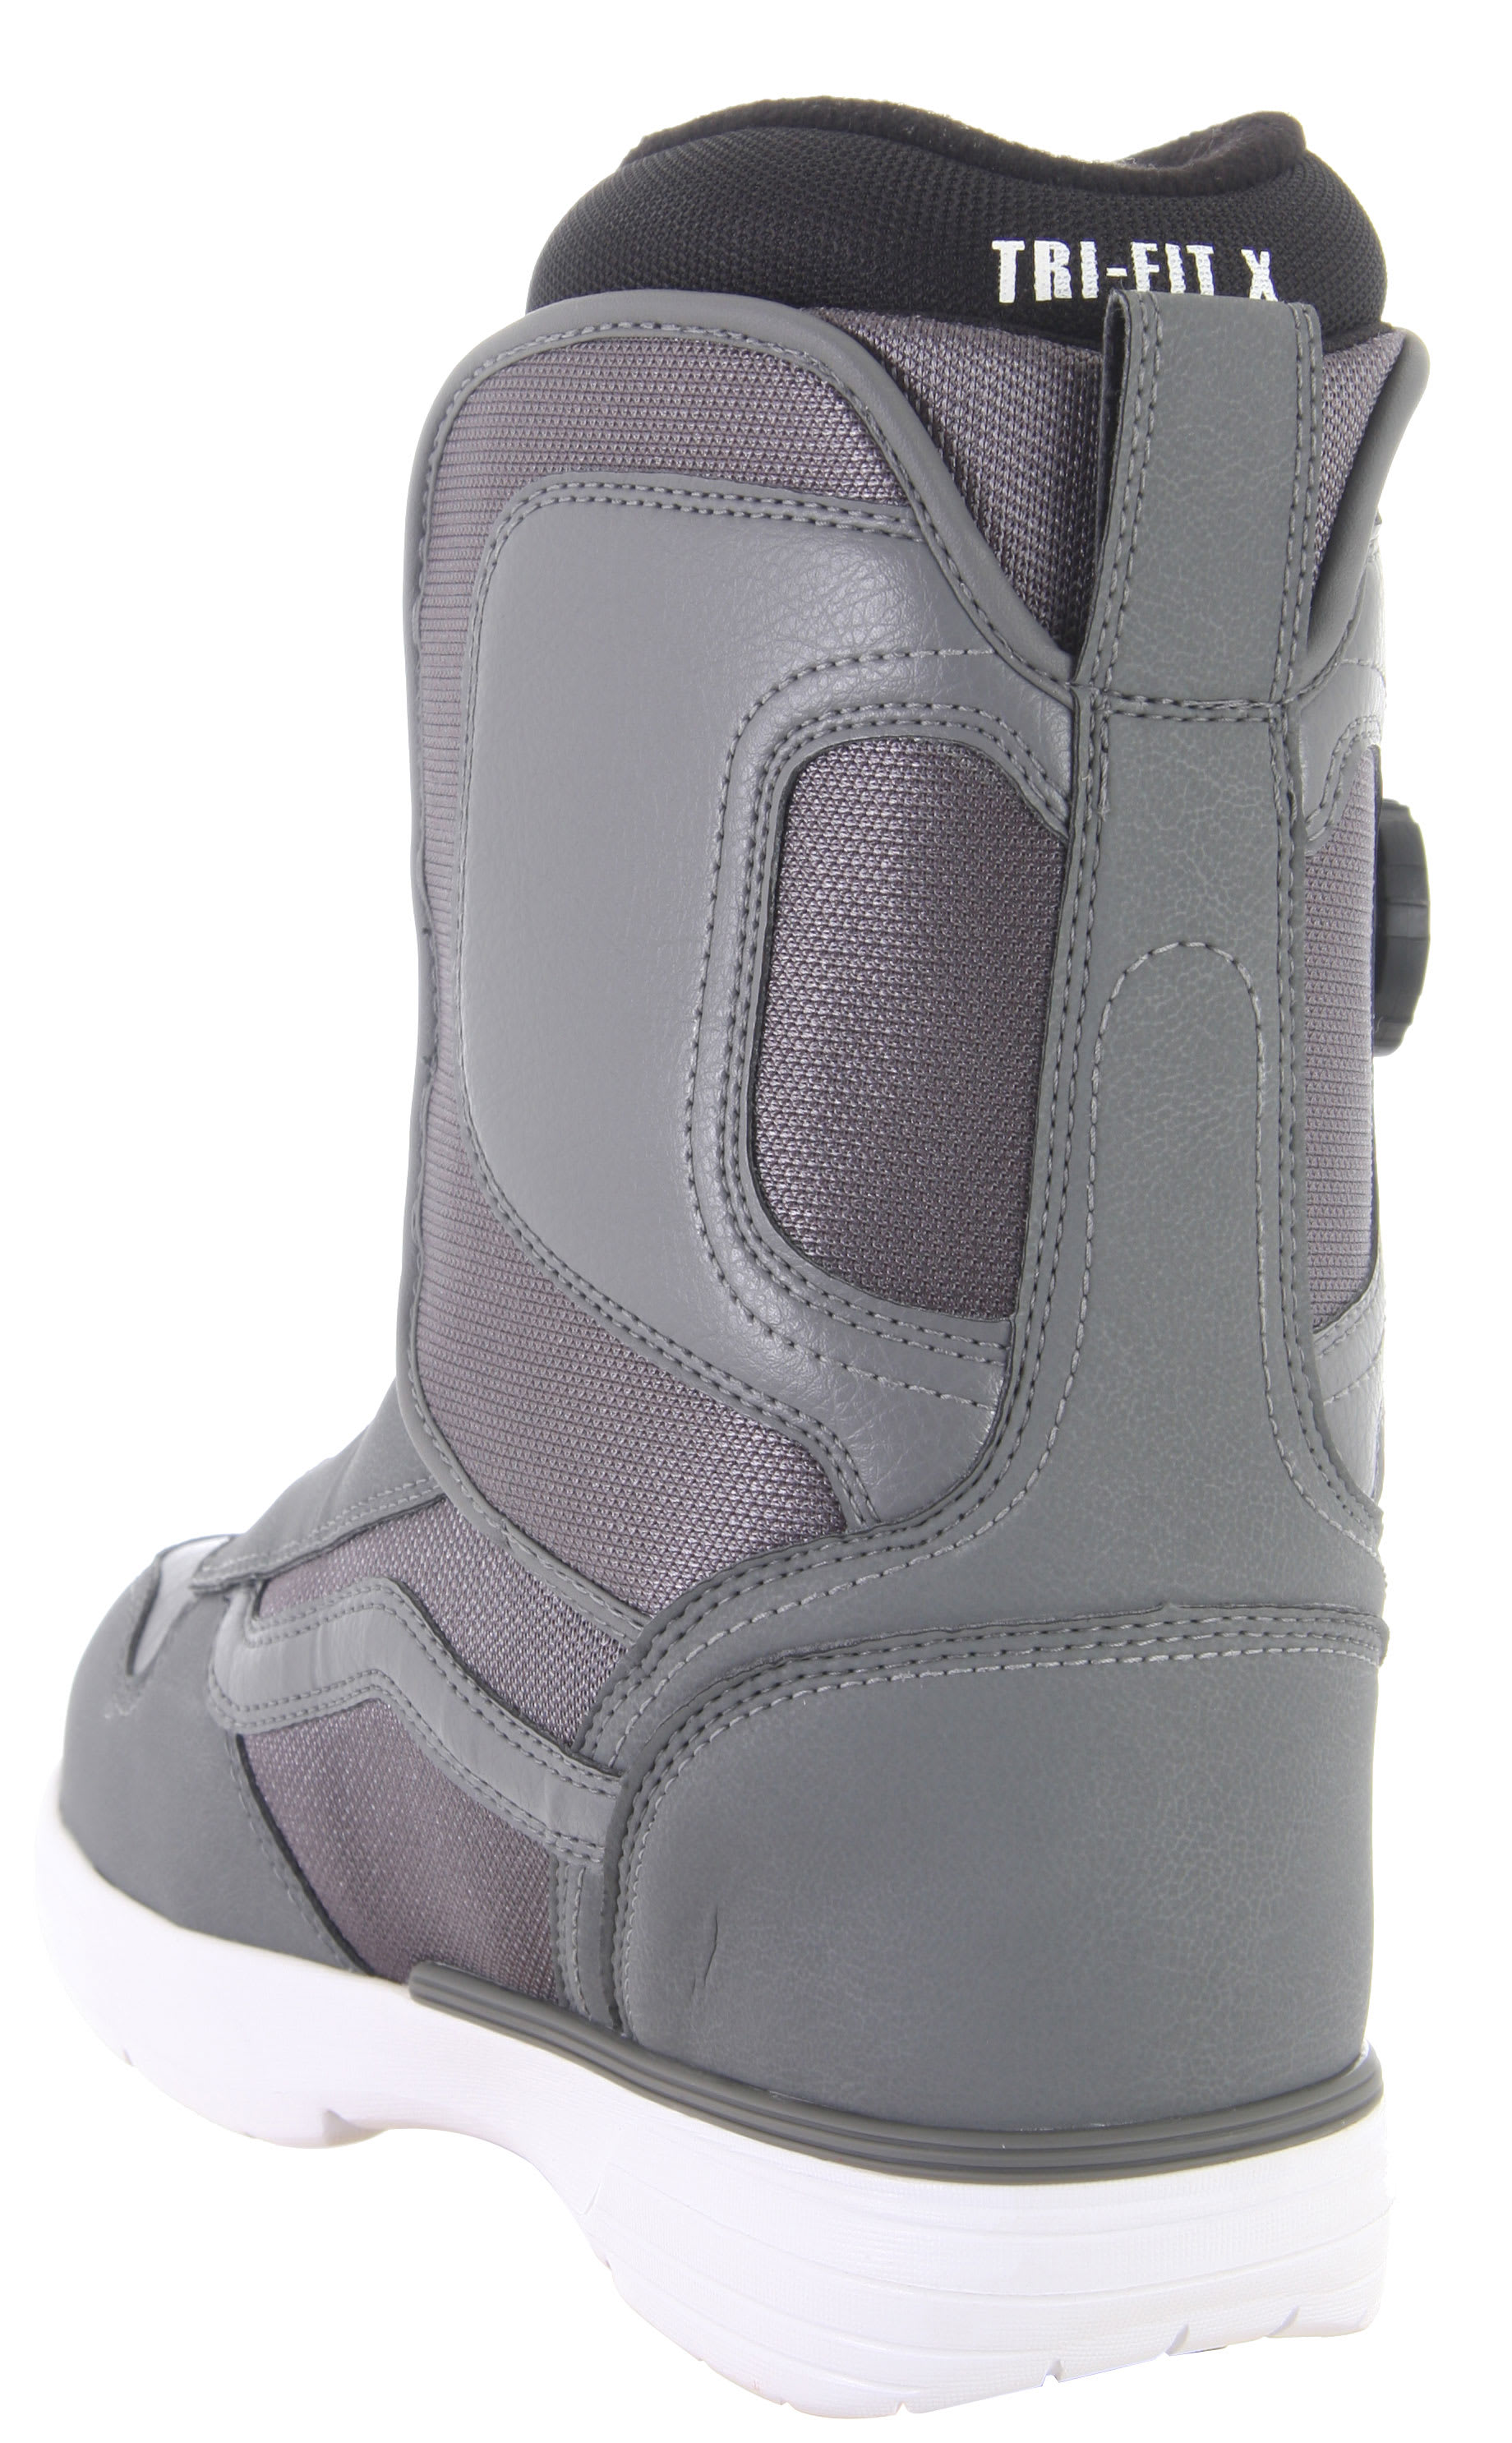 8636ec3b88 Vans Aura Snowboard Boots - thumbnail 3